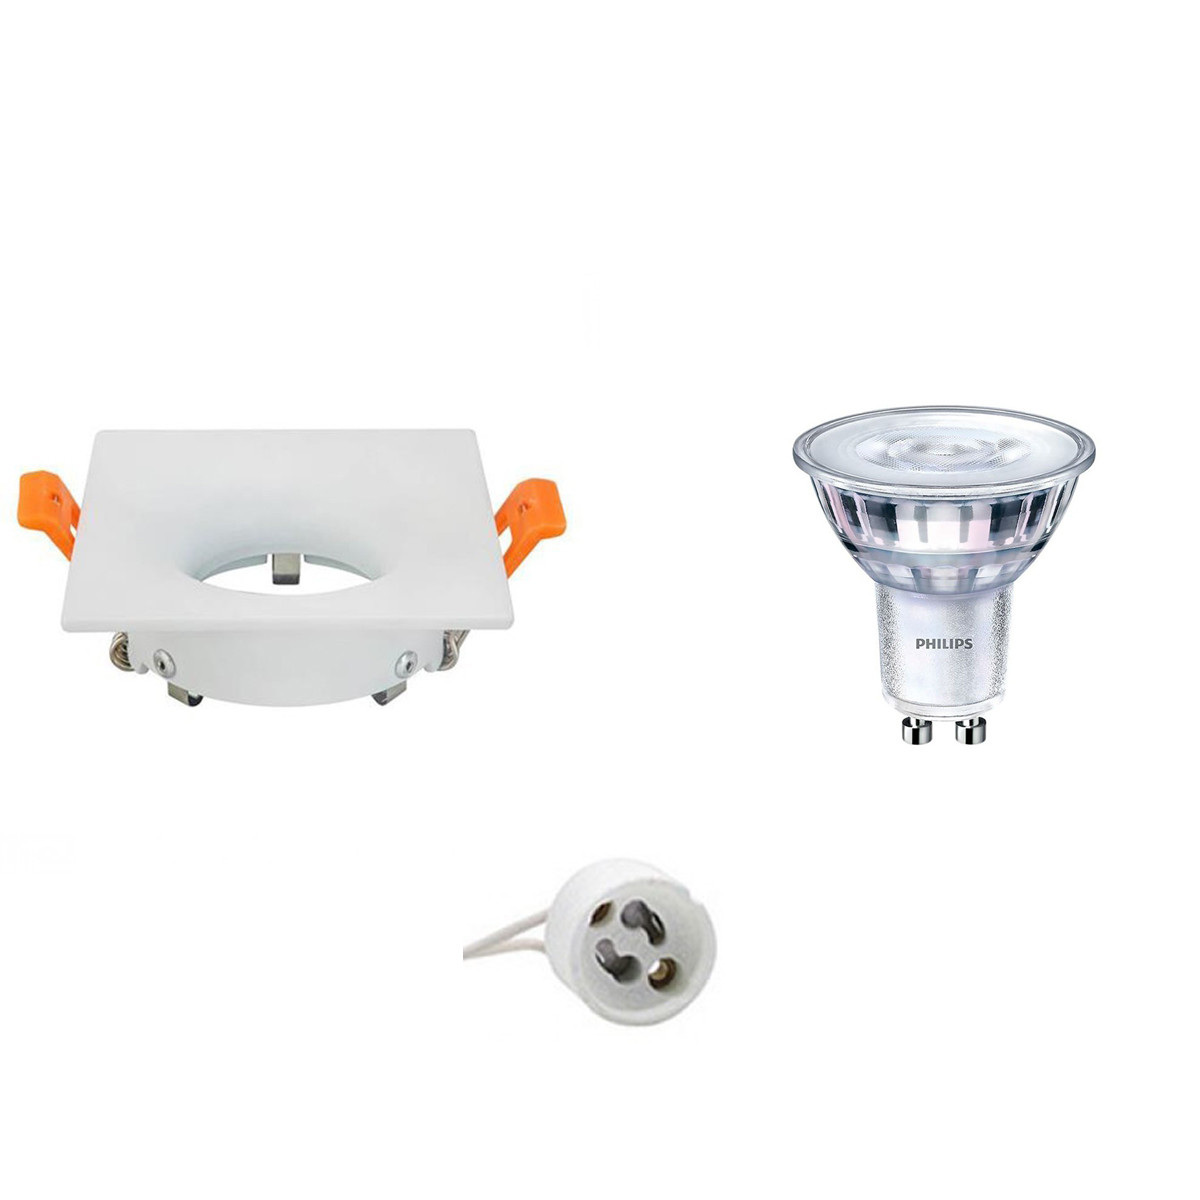 PHILIPS - LED Spot Set - SceneSwitch 827 36D - GU10 Fitting - Dimbaar - Inbouw Vierkant - Mat Wit -